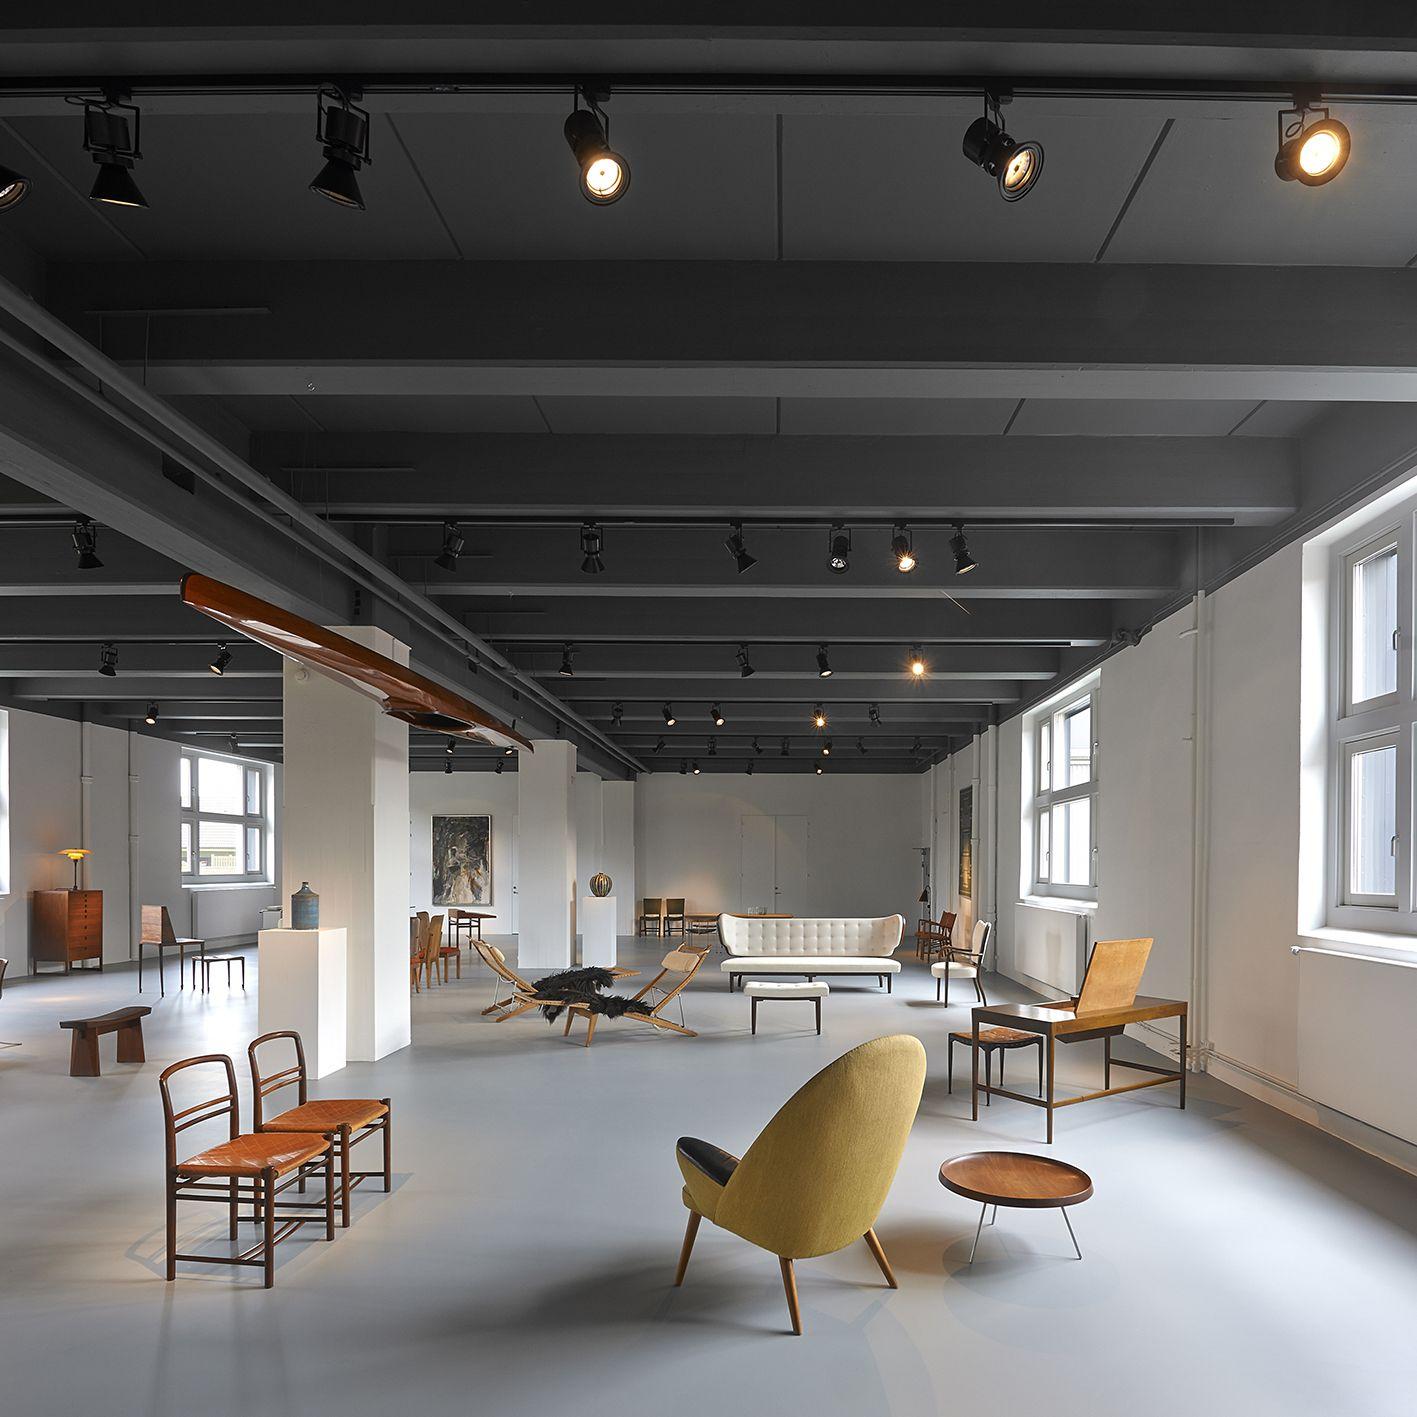 Dansk Møbelkunst Gallery - chairs by Arne Jacobsen - easy chair by Hans J Wegner - desk by Vestergaard Jensen